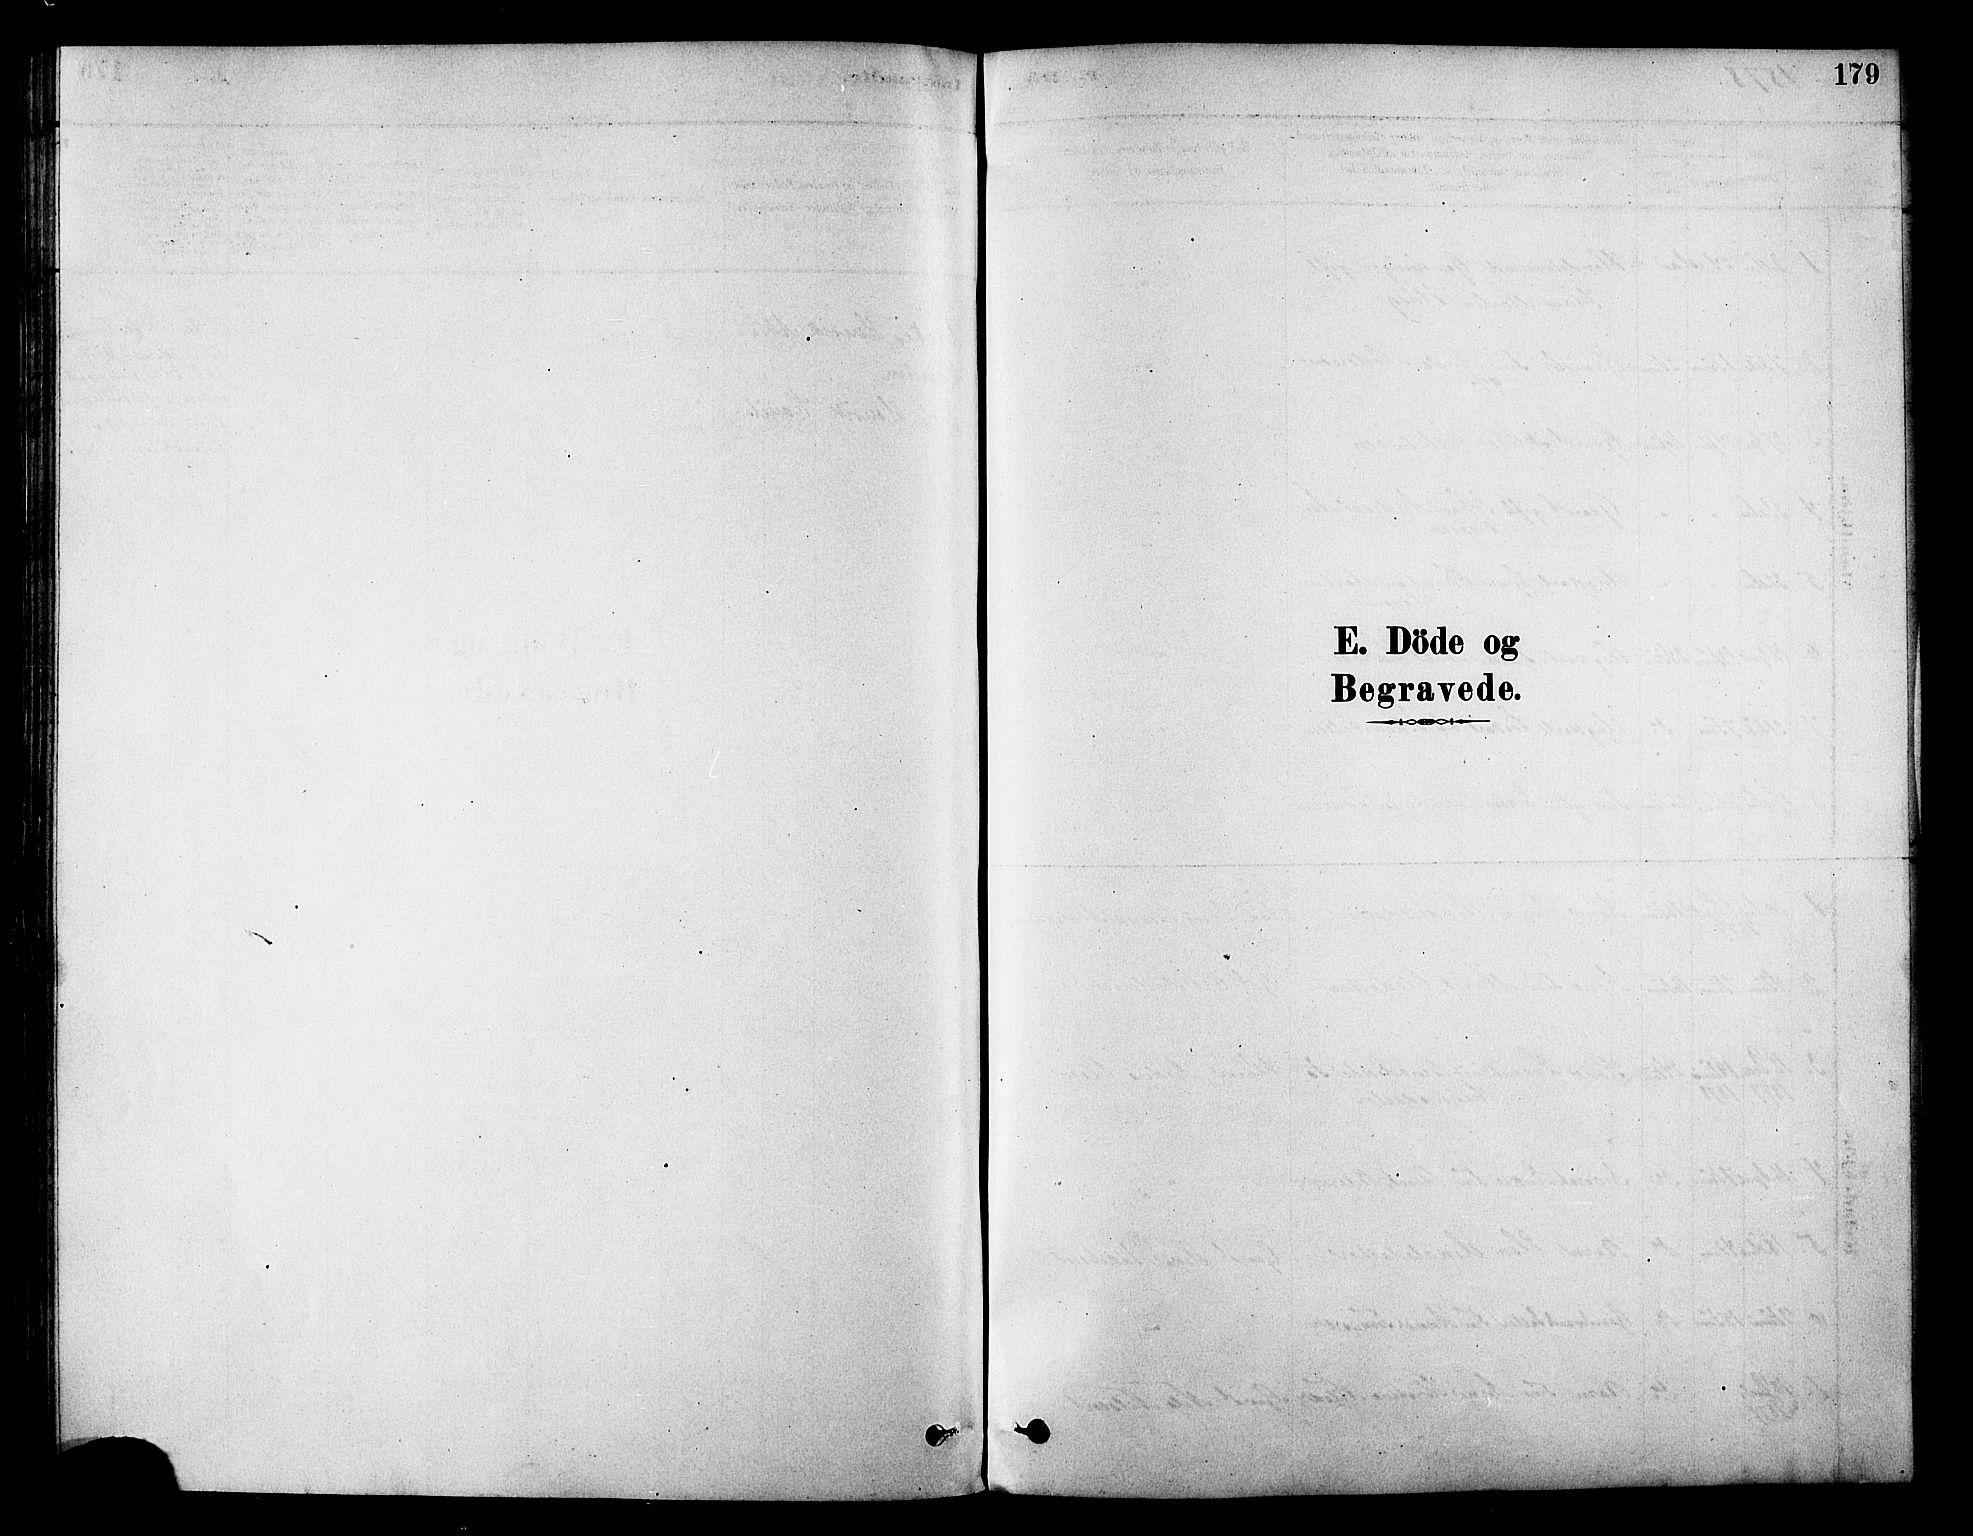 SATØ, Skjervøy sokneprestkontor, H/Ha/Haa/L0009kirke: Ministerialbok nr. 9, 1878-1887, s. 179